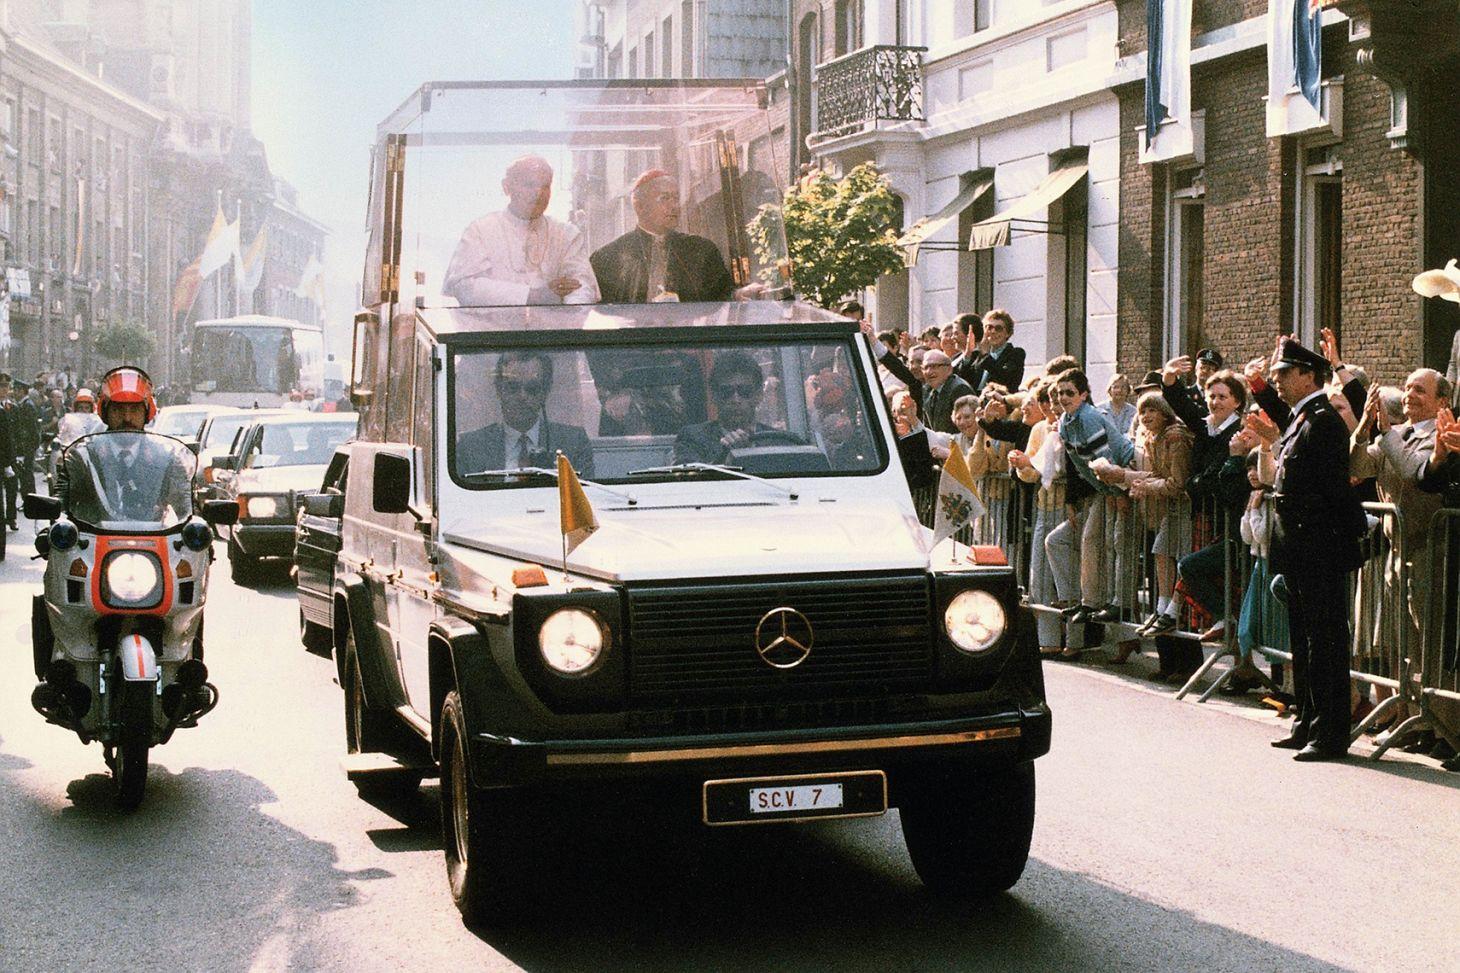 papamovel mercedes classe g visita papa alemanha 1980